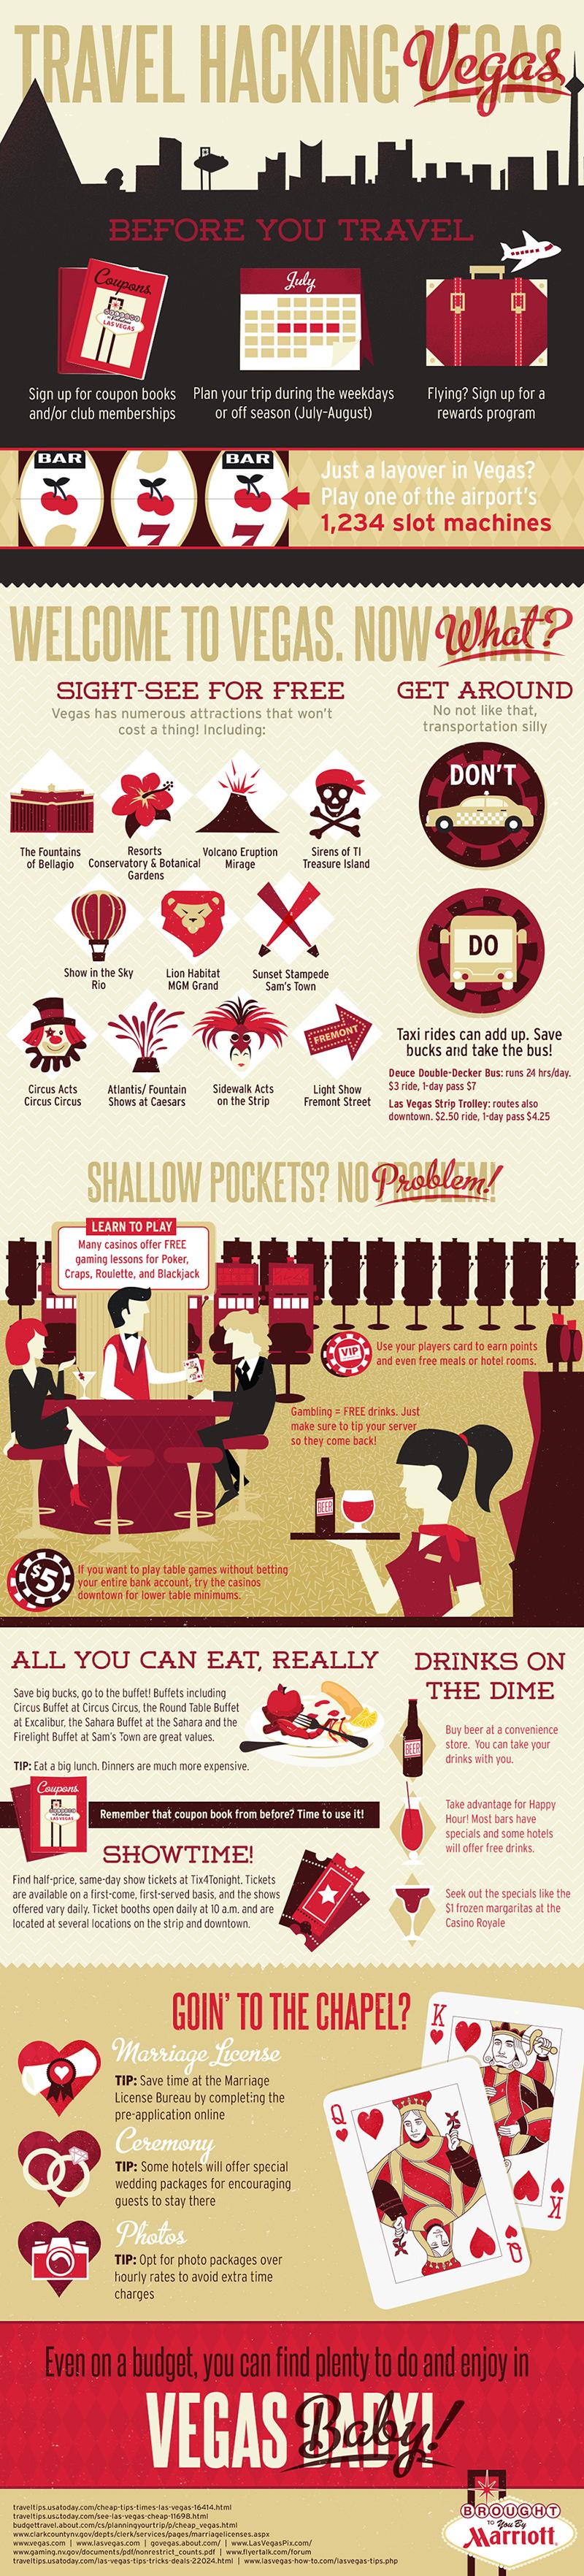 travel-hacking-vegas--las-vegas-deals-infographic_50e7523ebc2a0